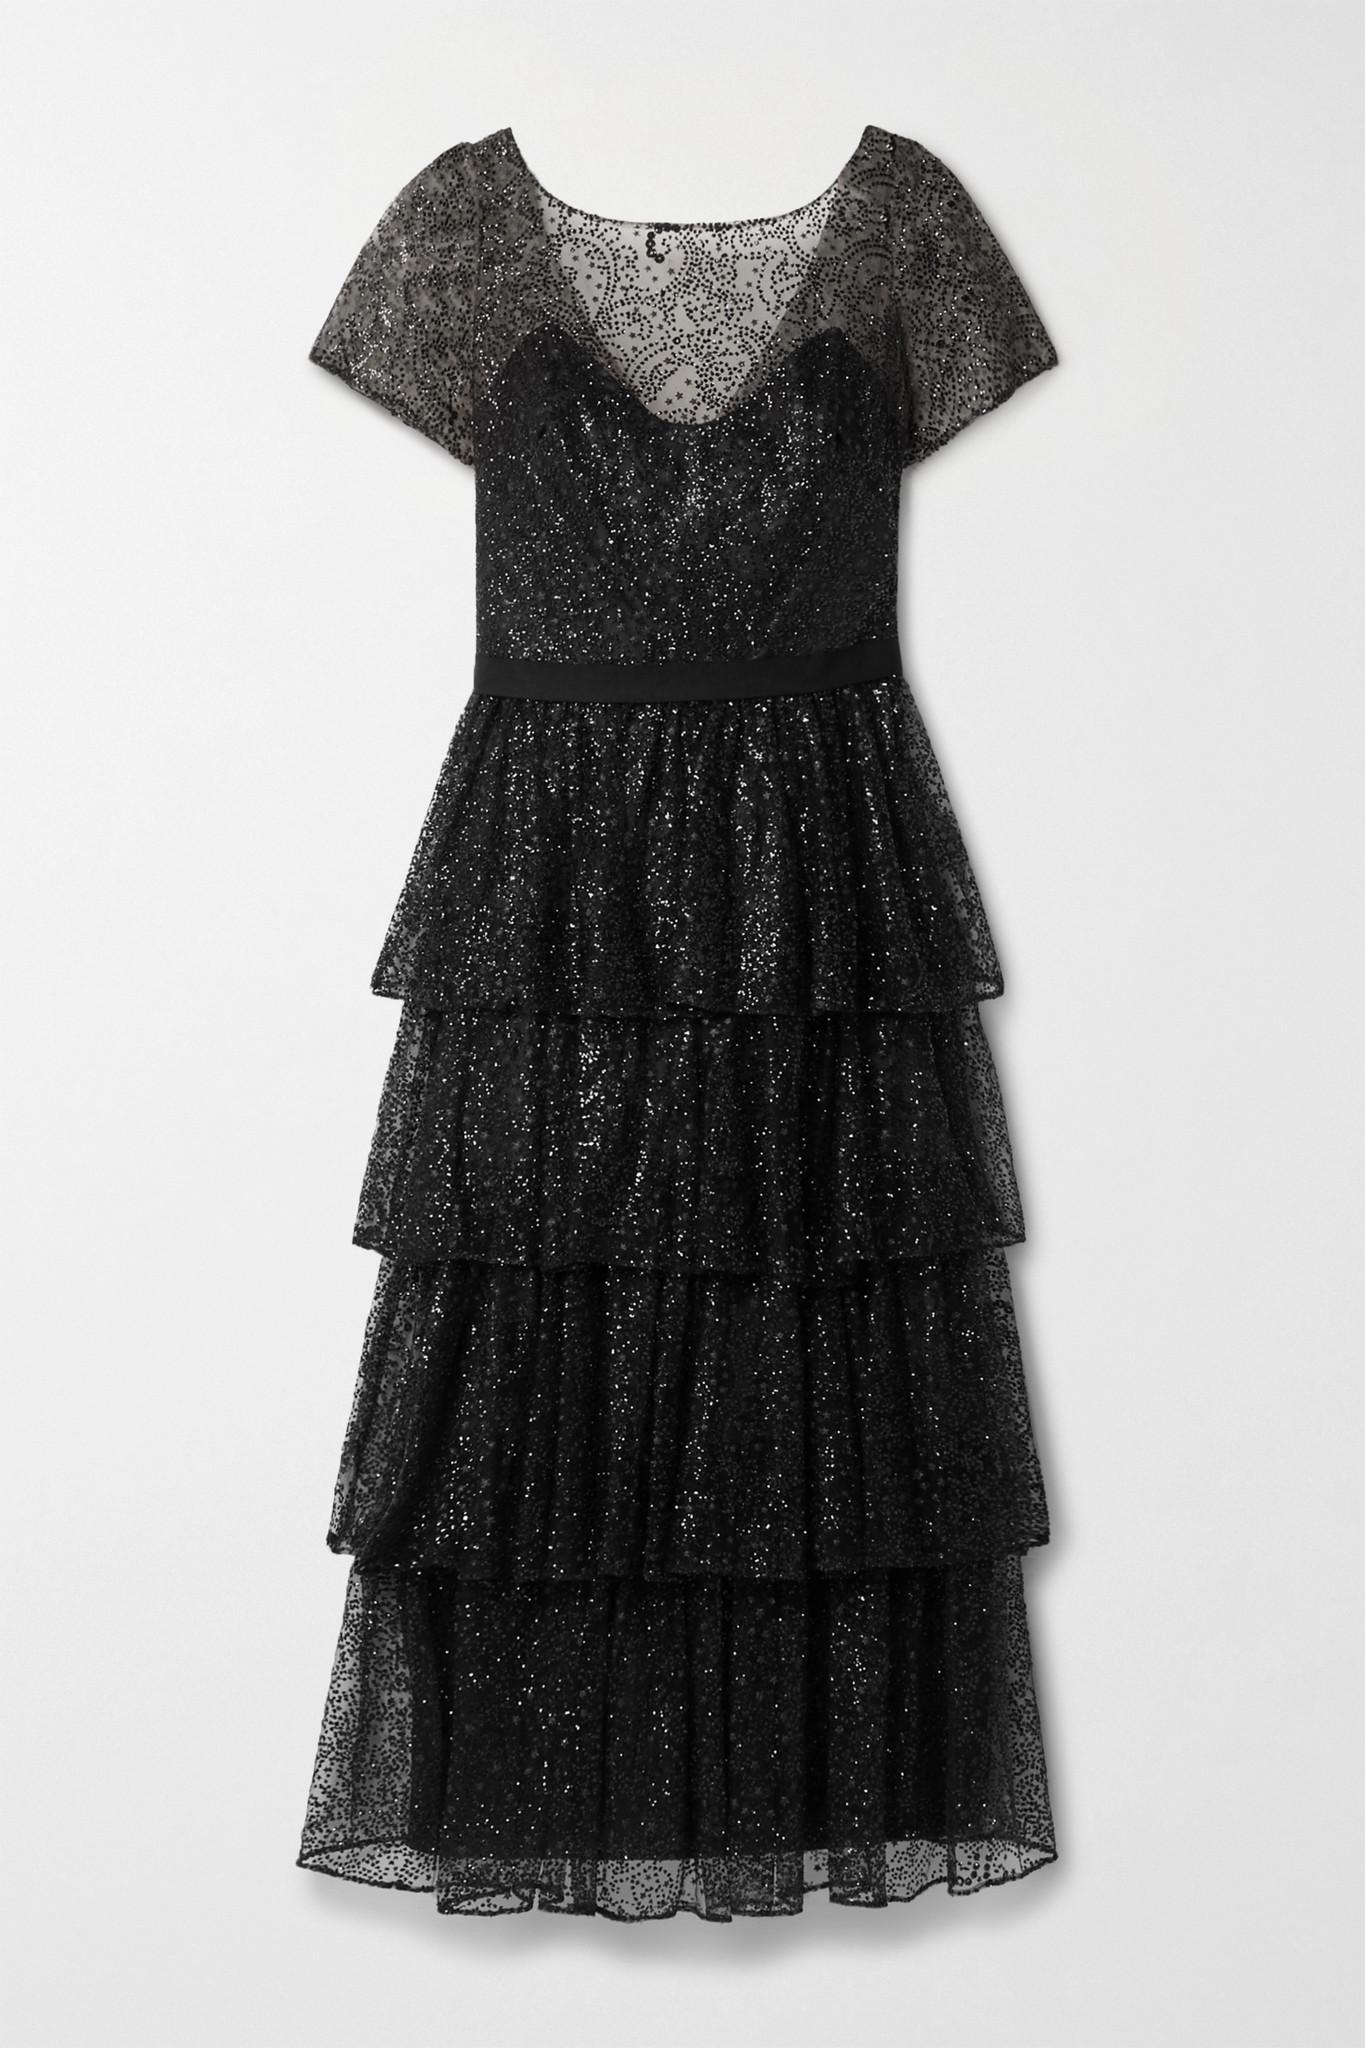 MARCHESA NOTTE - Tiered Glittered Tulle Midi Dress - Black - US10